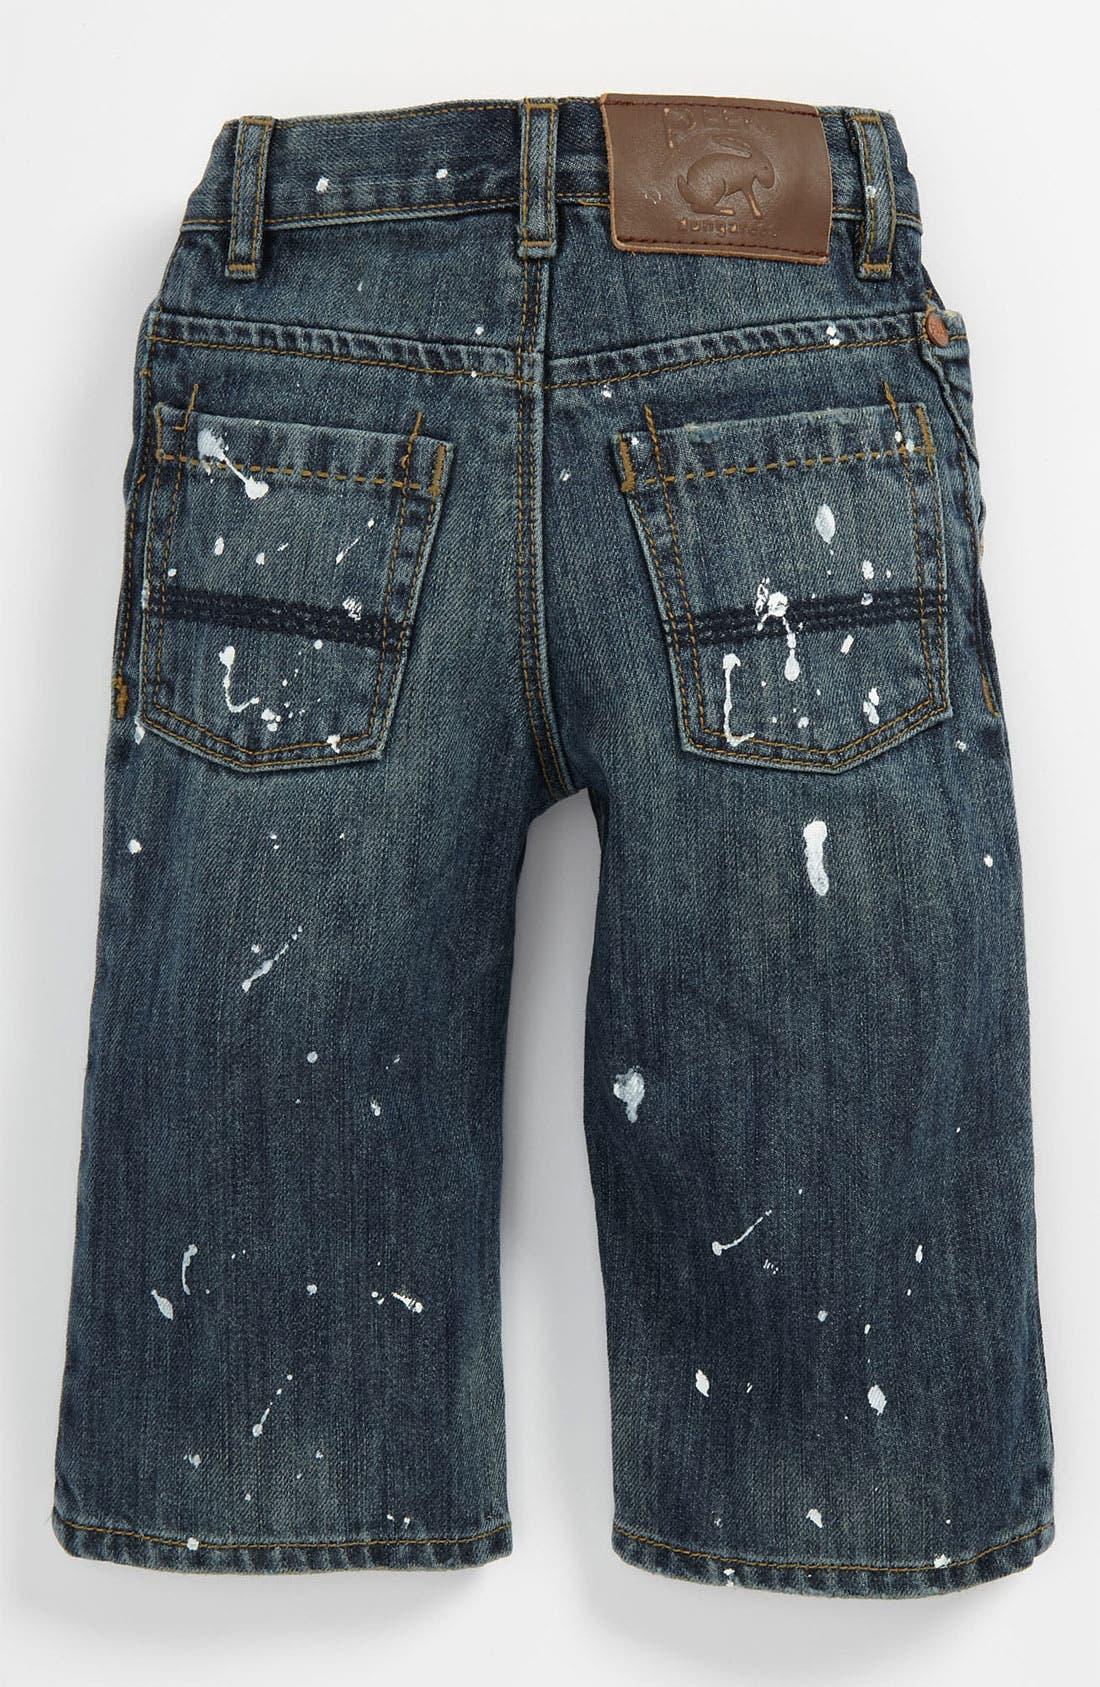 Main Image - Peek 'Peanut' Paint Splatter Jeans (Baby)